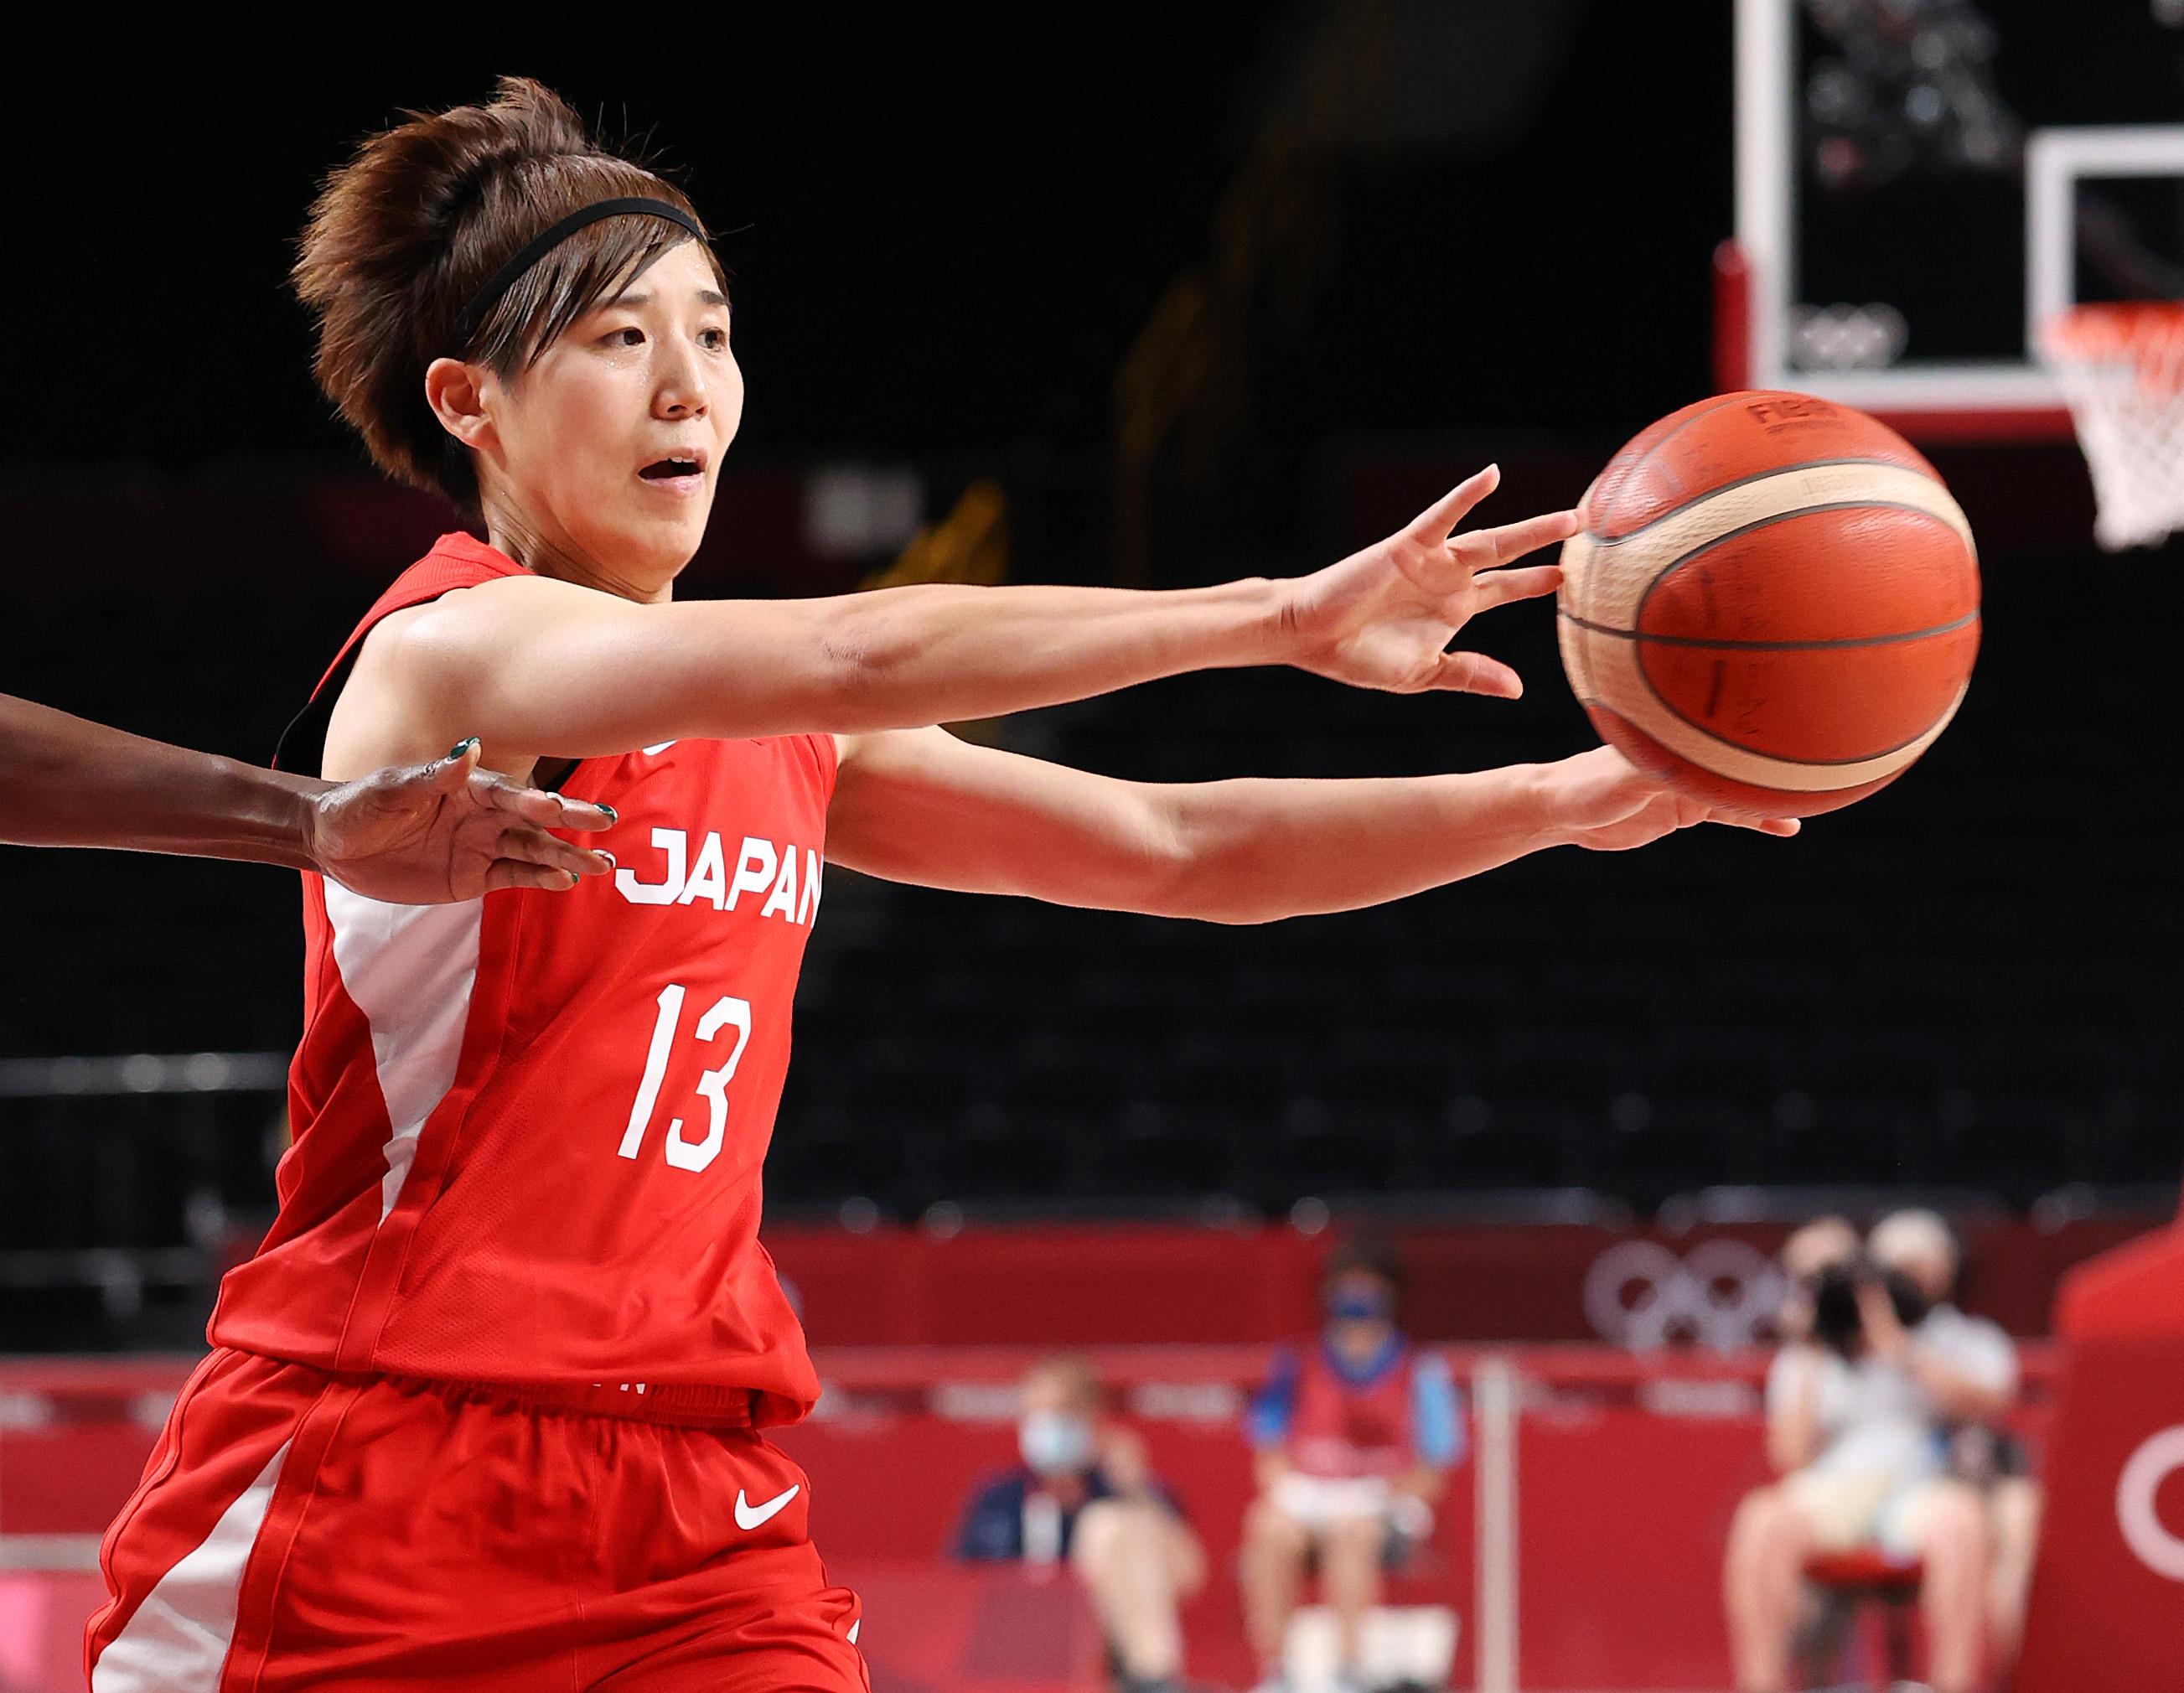 Nigeria v Japan Basketball - Olympics: Day 10